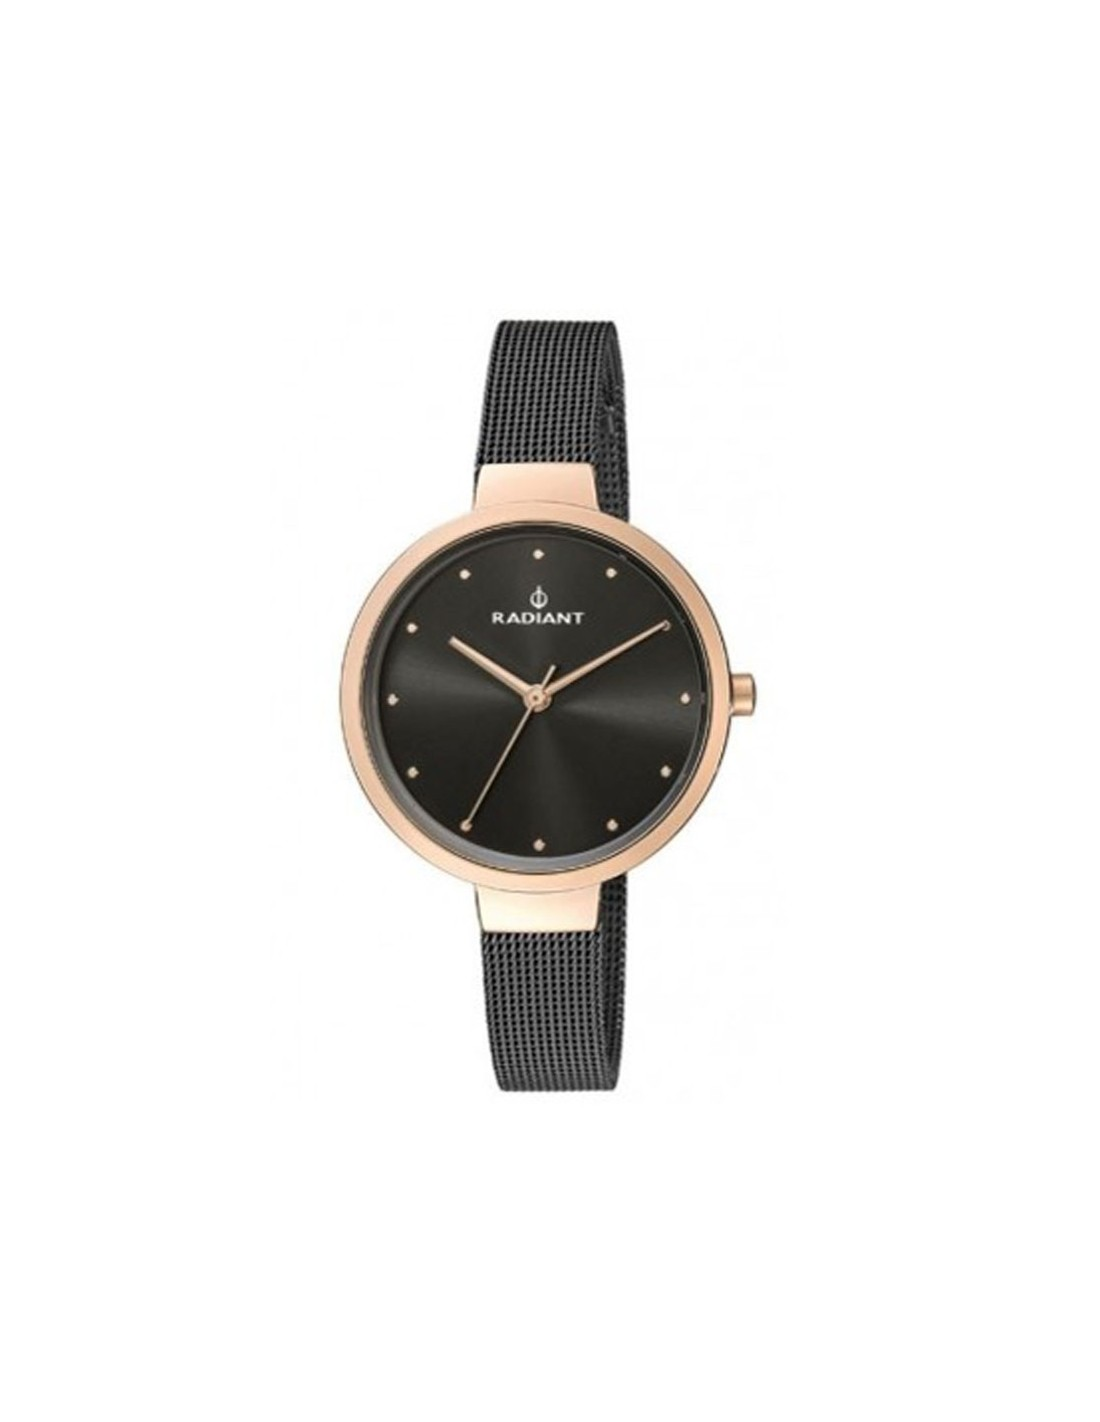 e621006ec5f0 Reloj Radiant RA416208 - Relojes Radiant